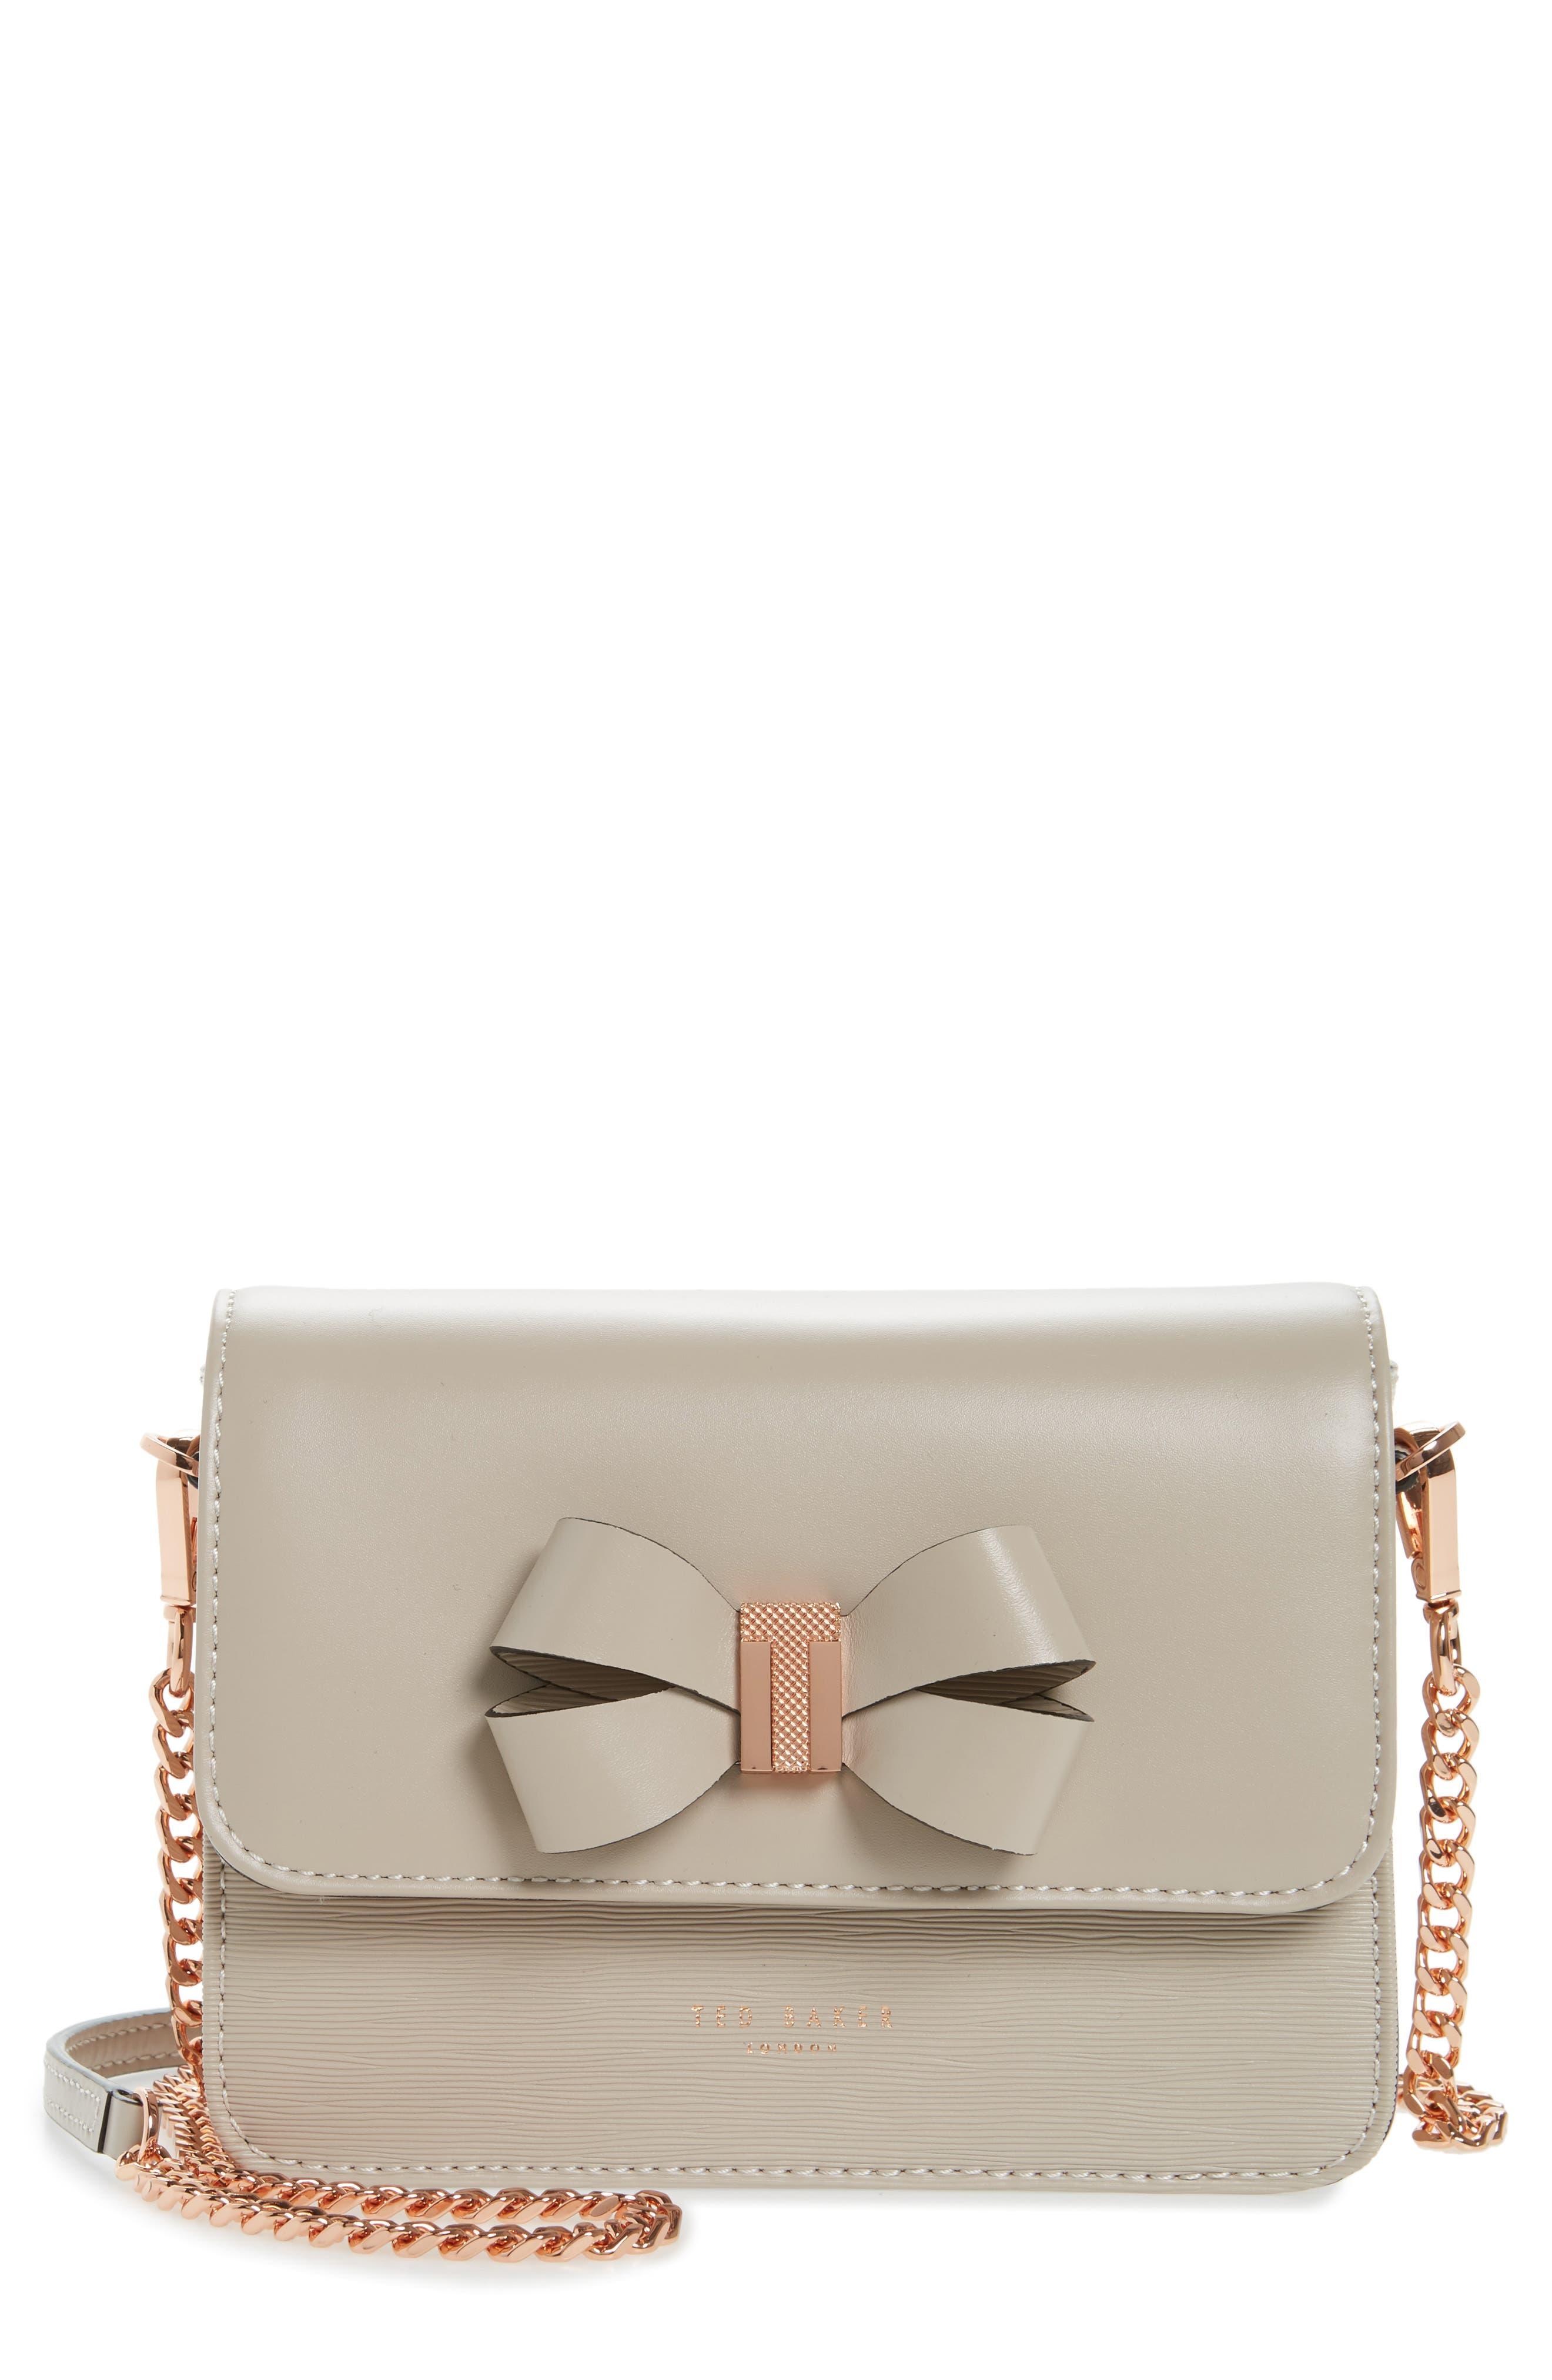 Ted Baker London Callih Bow Leather Crossbody Bag